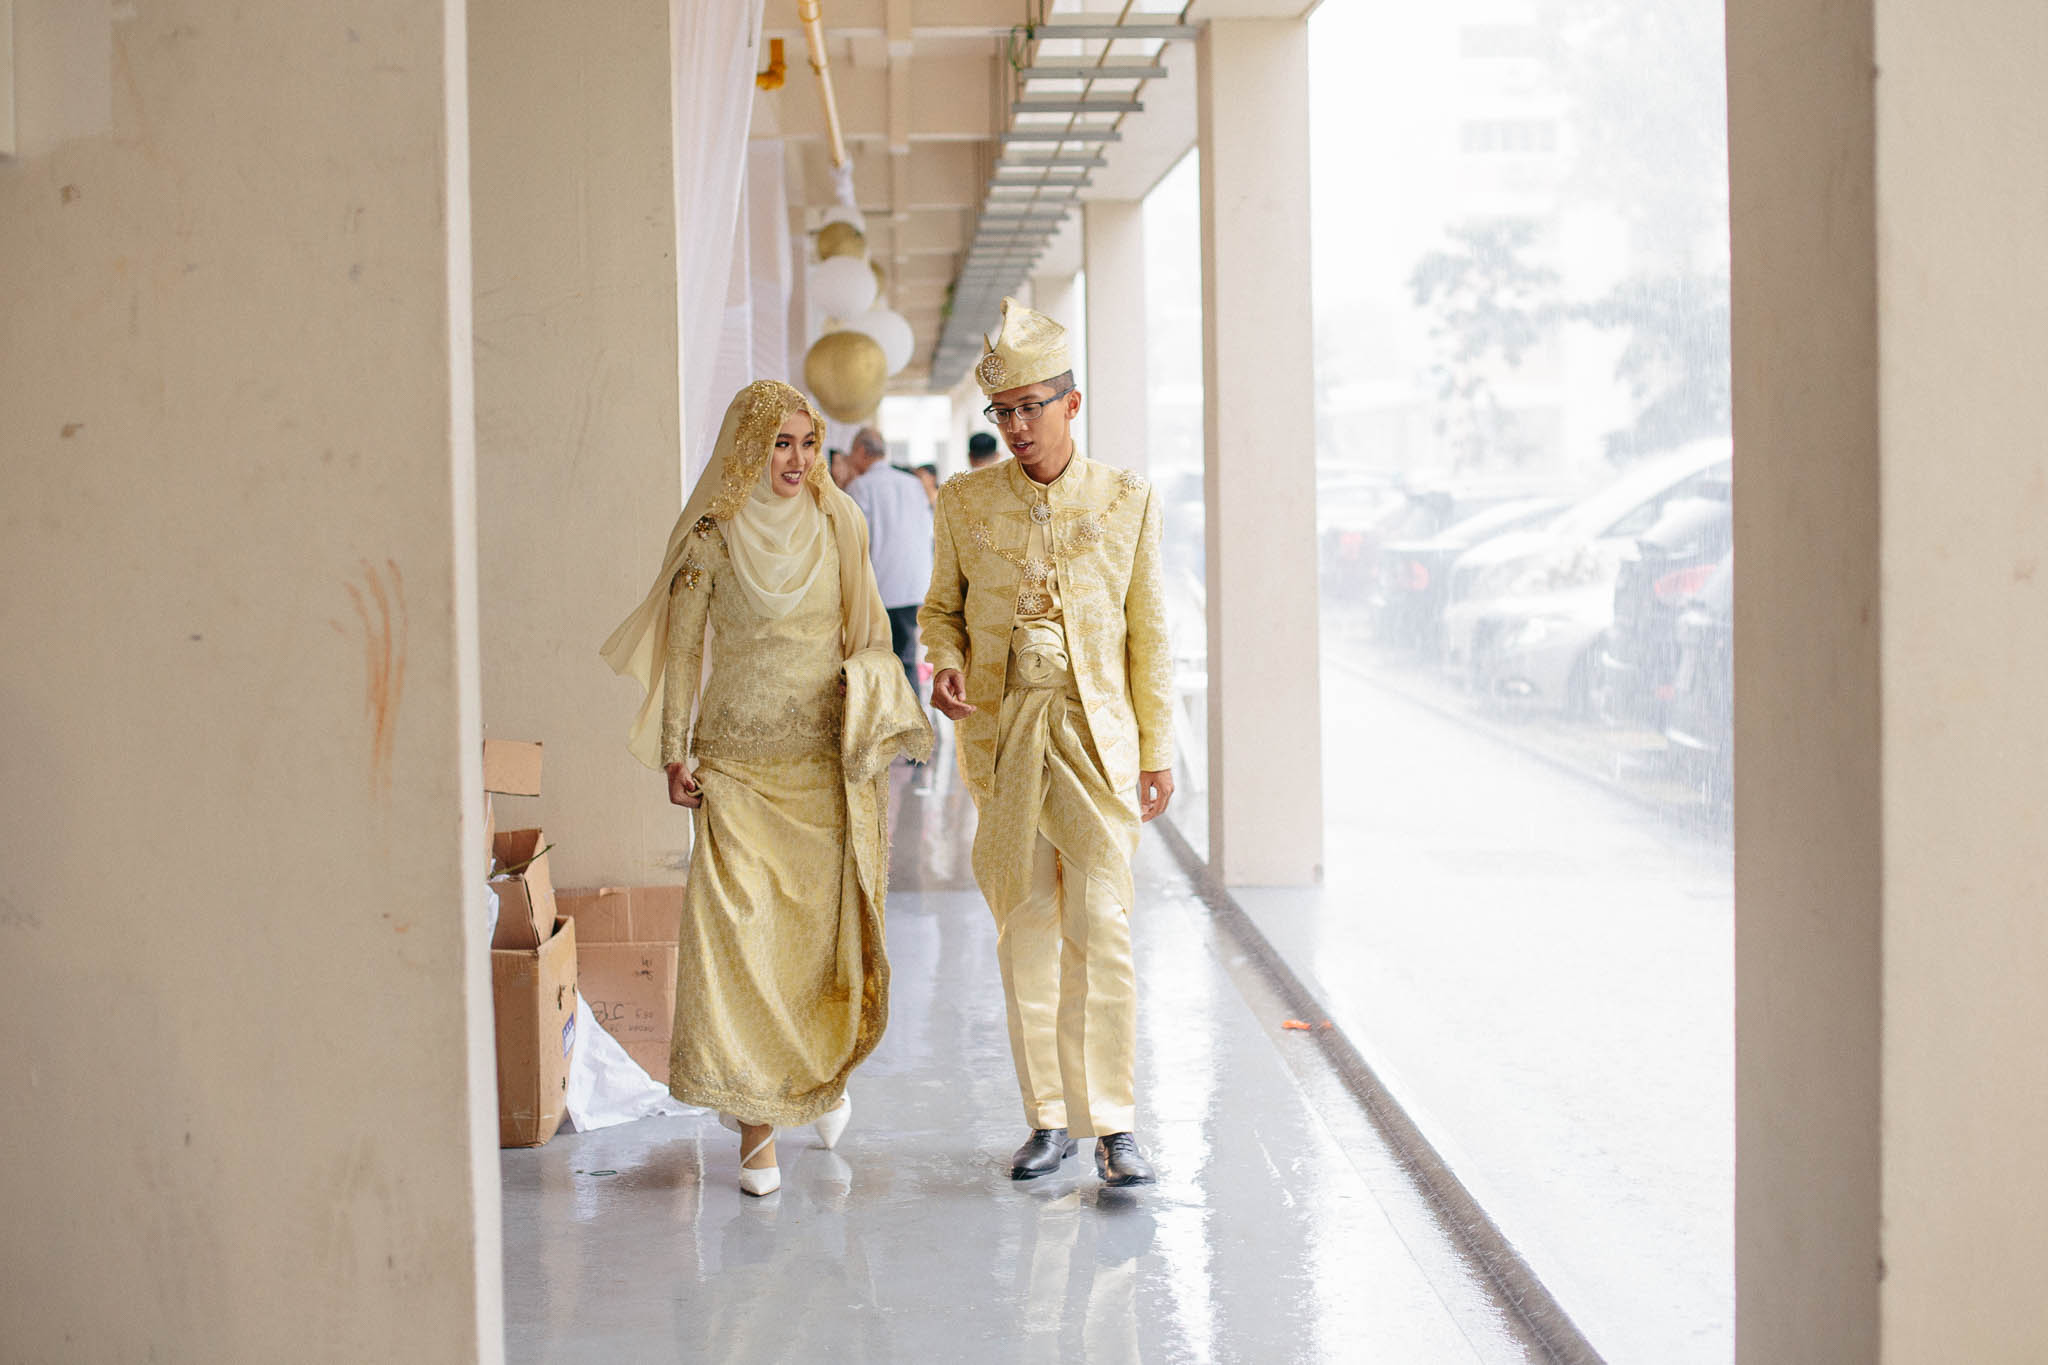 singapore-wedding-photographer-sharalyn-syazwan-039.jpg